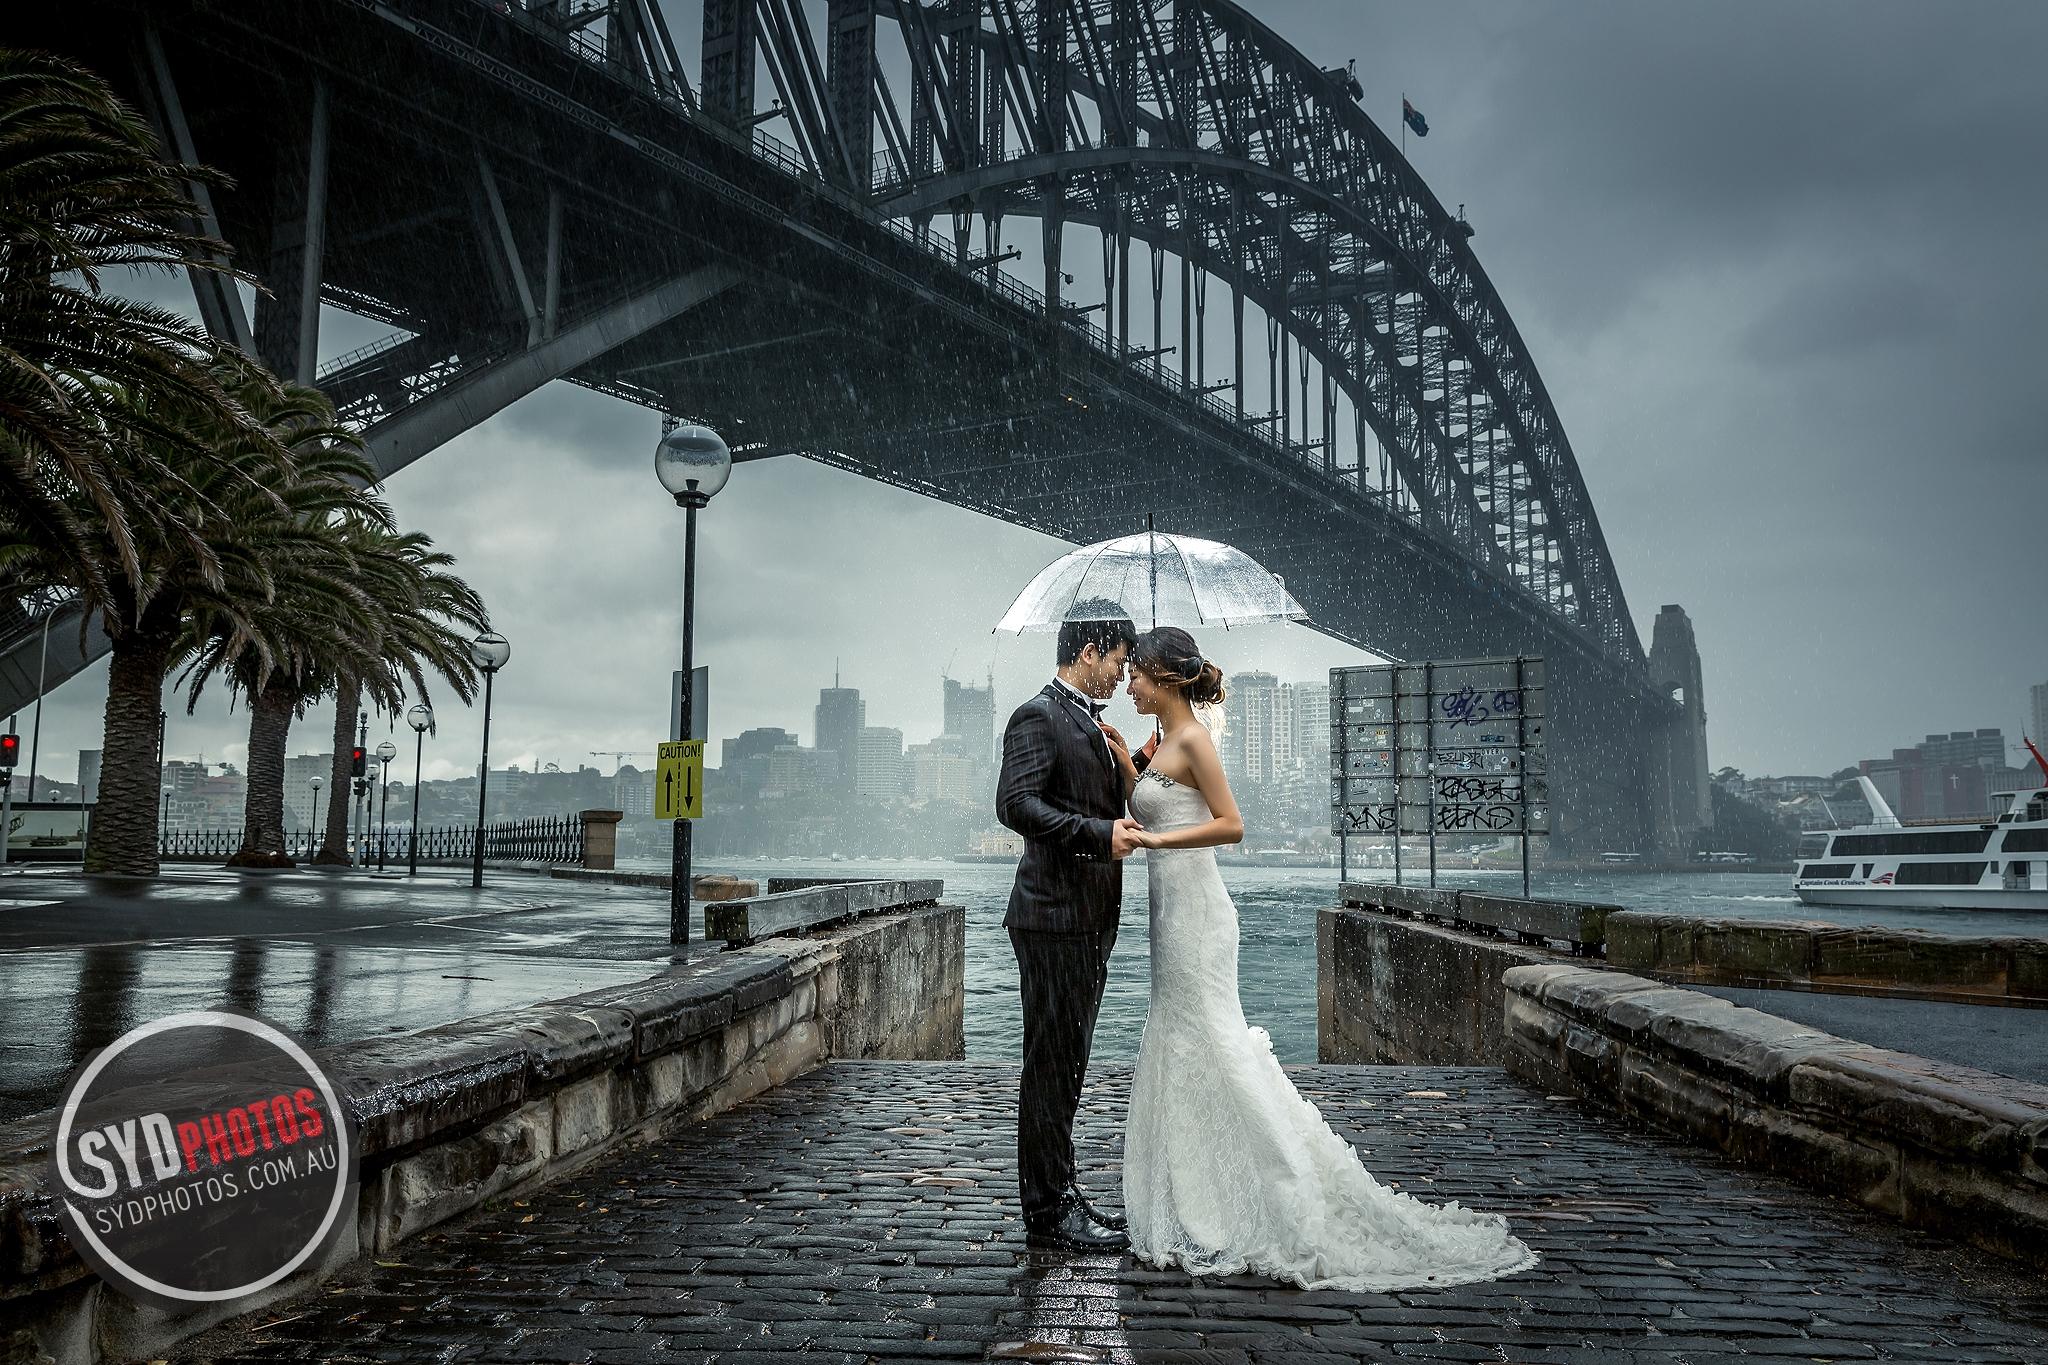 ID-104470-武小姐-Prewedding-悉尼婚纱摄影